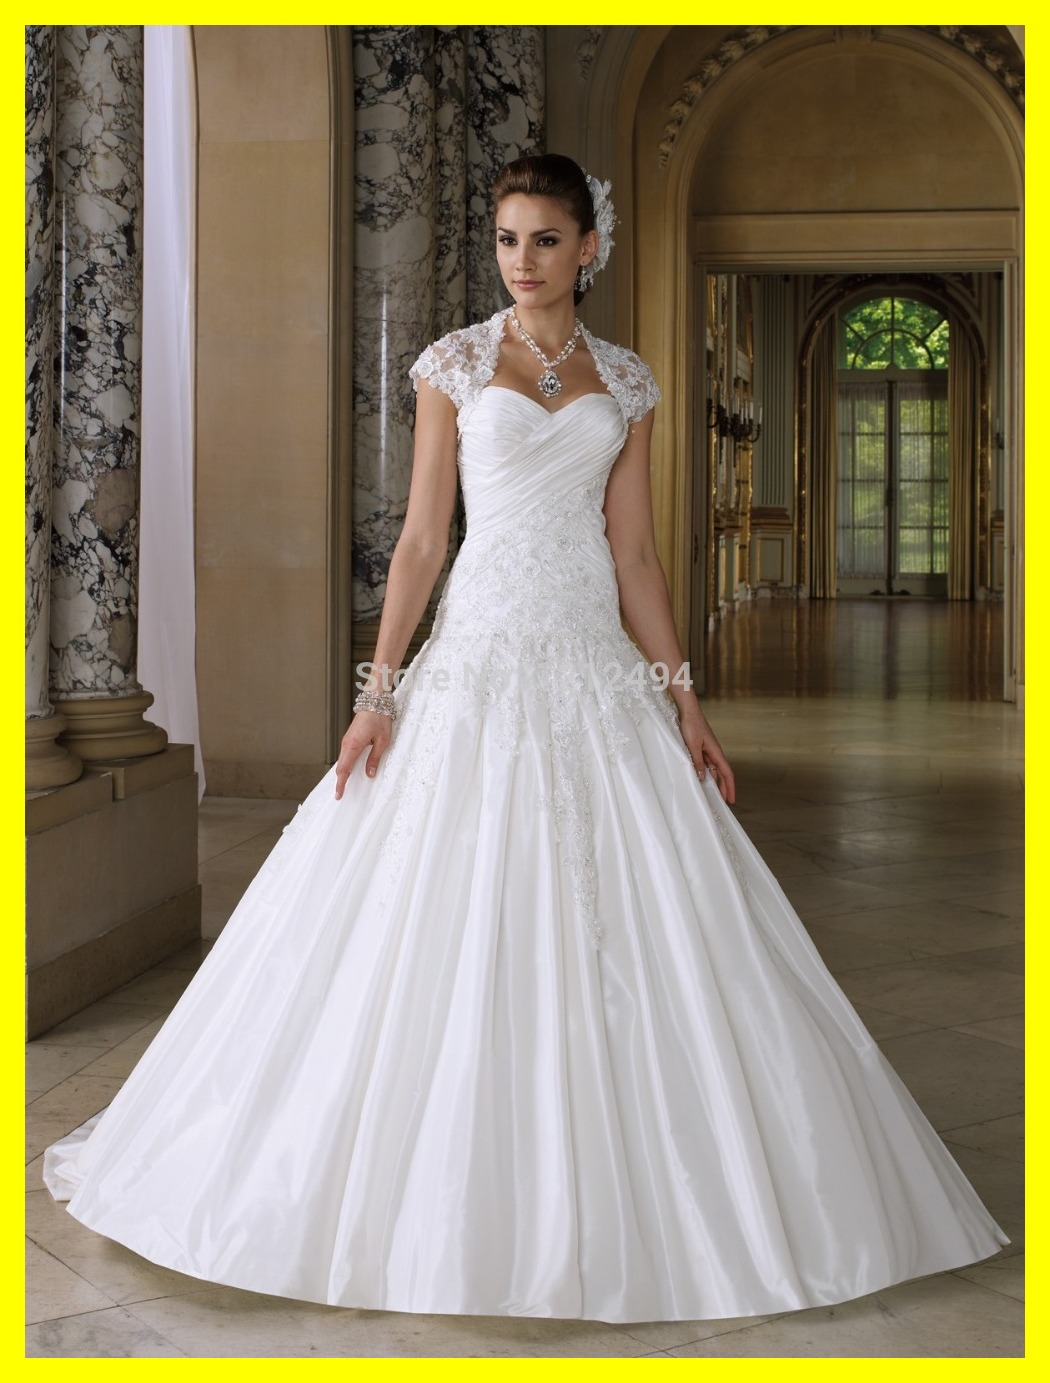 Wedding Dresses Beaded Black And White Zac Posen Long Ball Gown ...